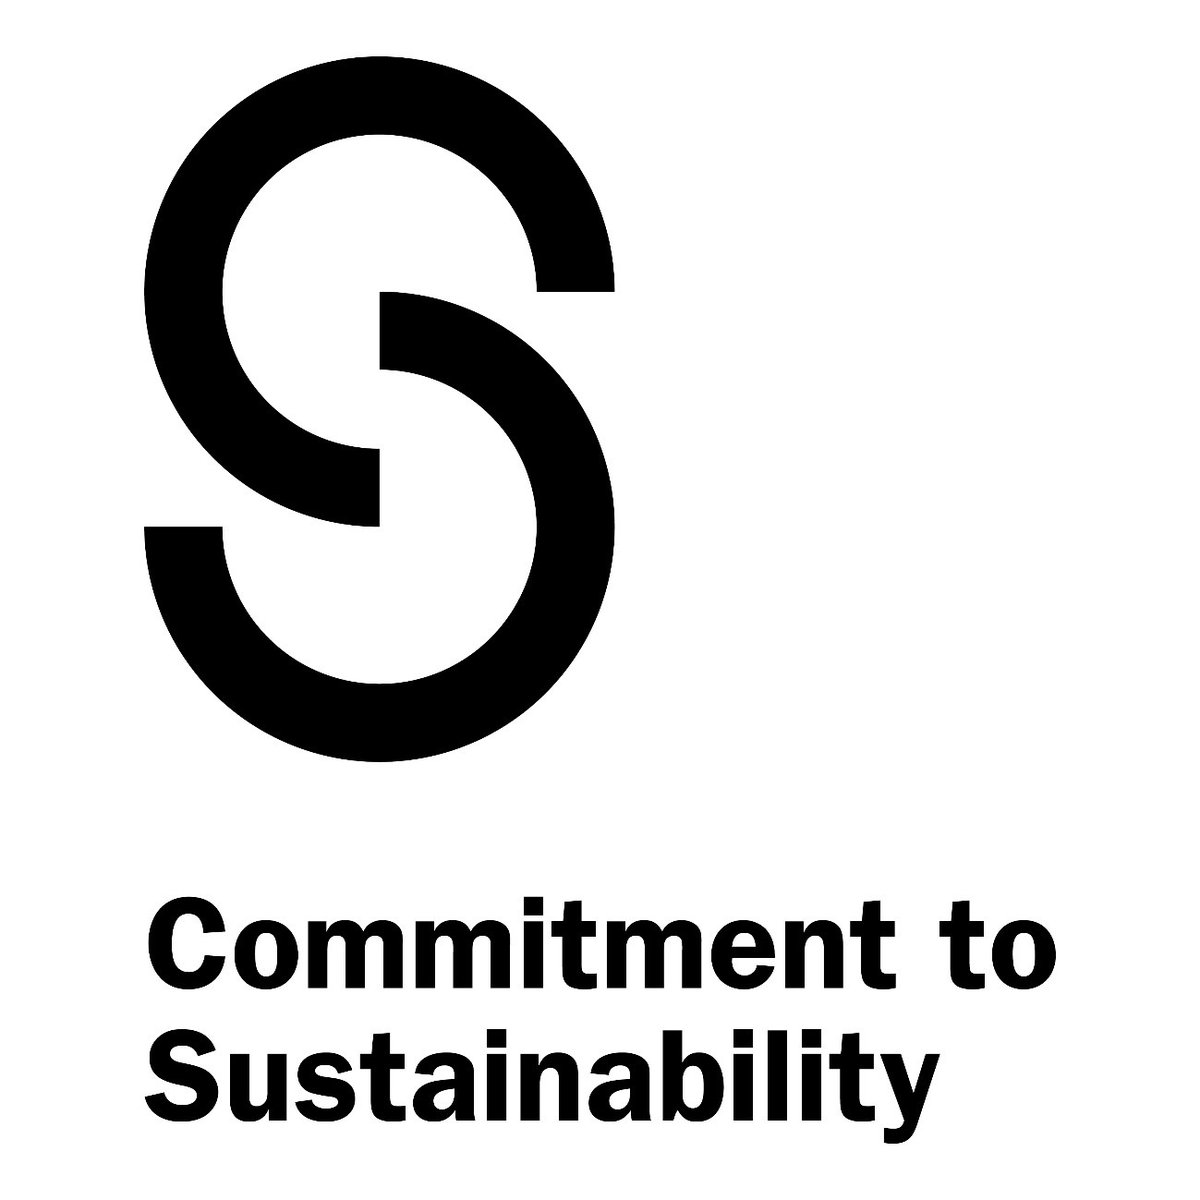 .@BancoSabadell groups its sustainability initiatives under the umbrella #SabadellSustainabilityCommitment https://t.co/m94H1PTQdB https://t.co/9Kj5KBRn8F